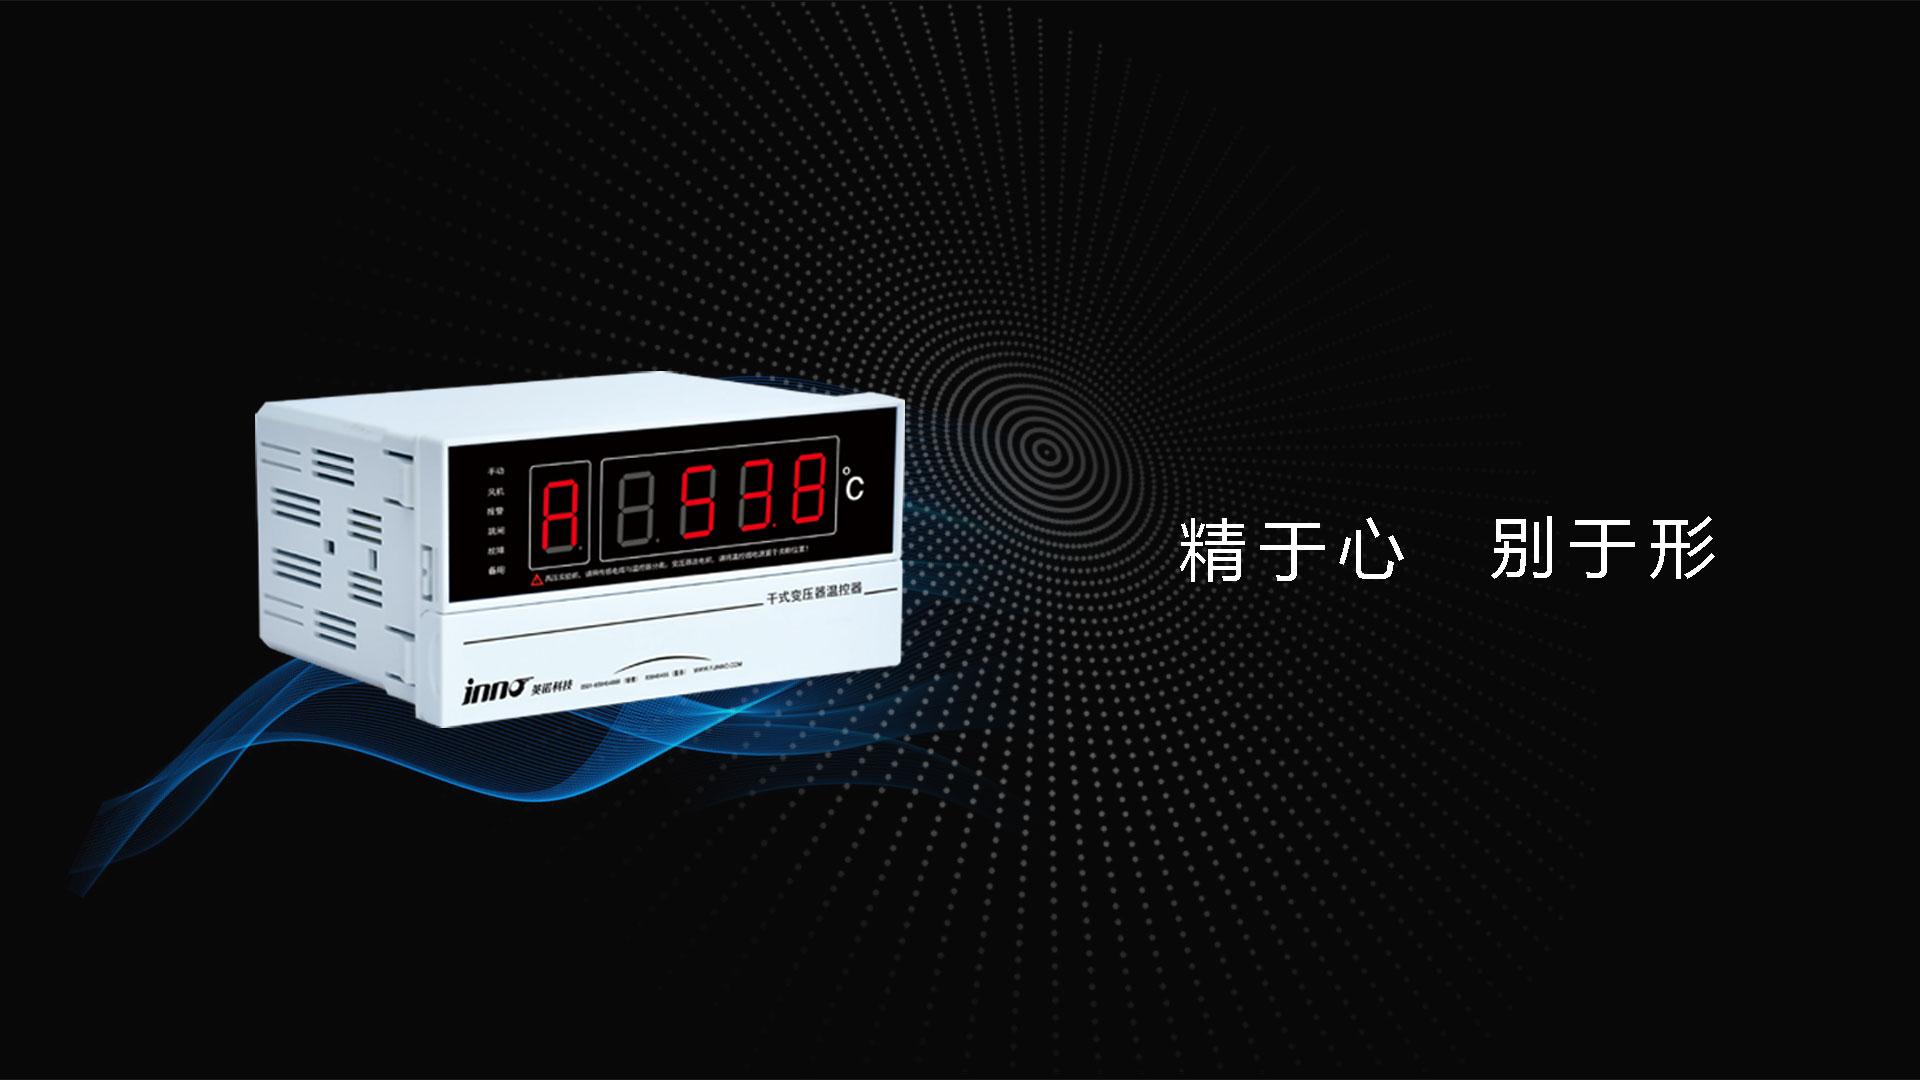 IB-S201干变温控器